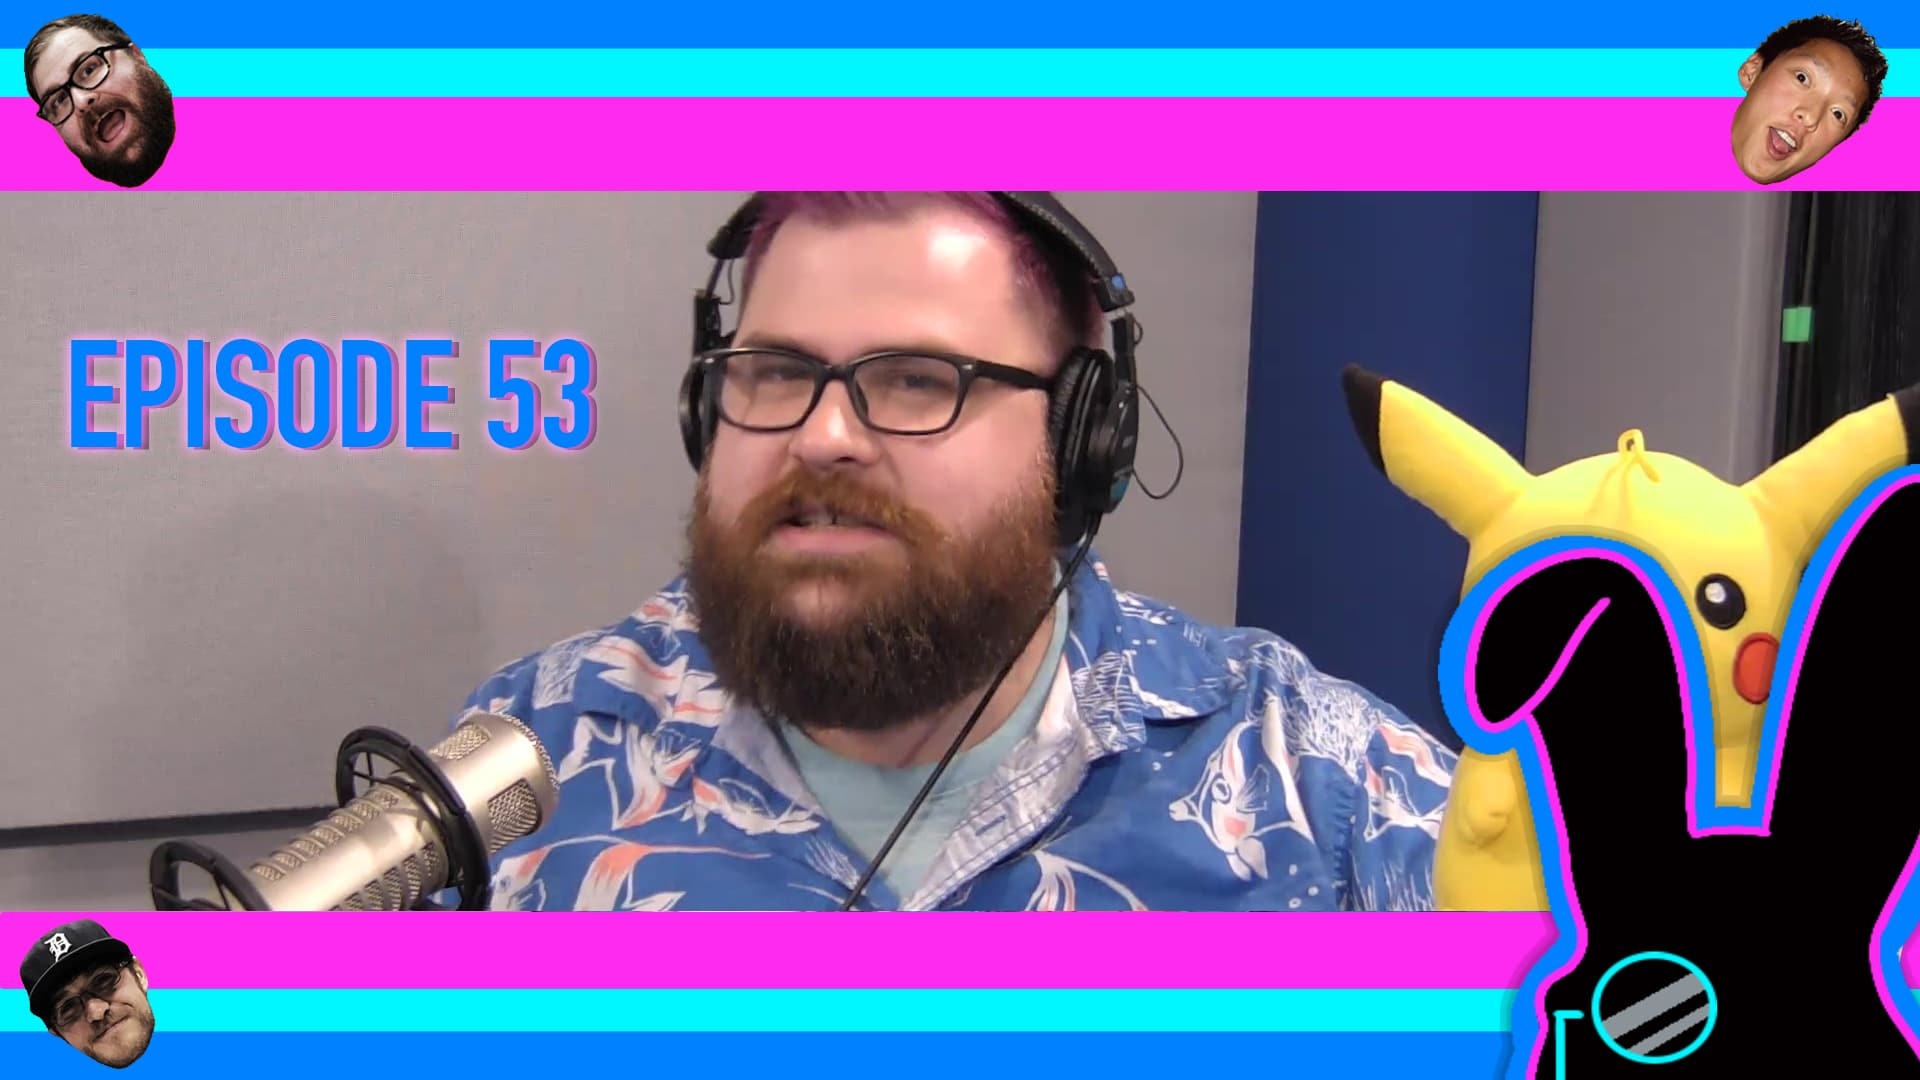 Geektainment Weekly - Episode 53